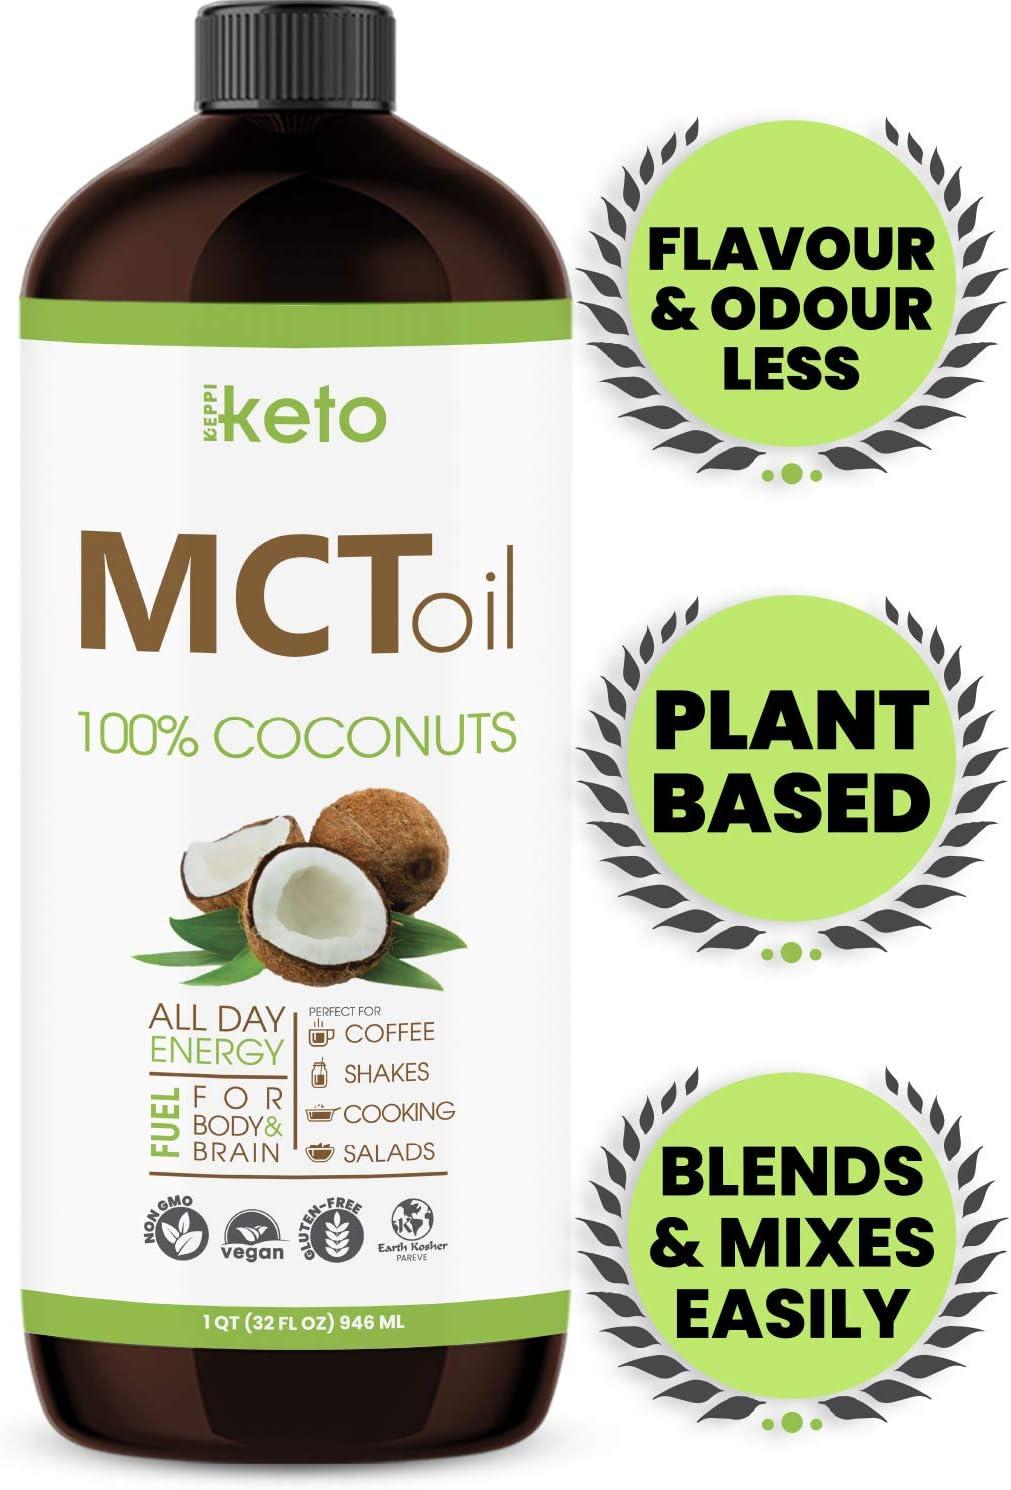 Premium MCT Oil Keto Non GMO Coconuts & Paleo Diet Friendly - Coffee Shakes & Salads. BPA Free 32oz